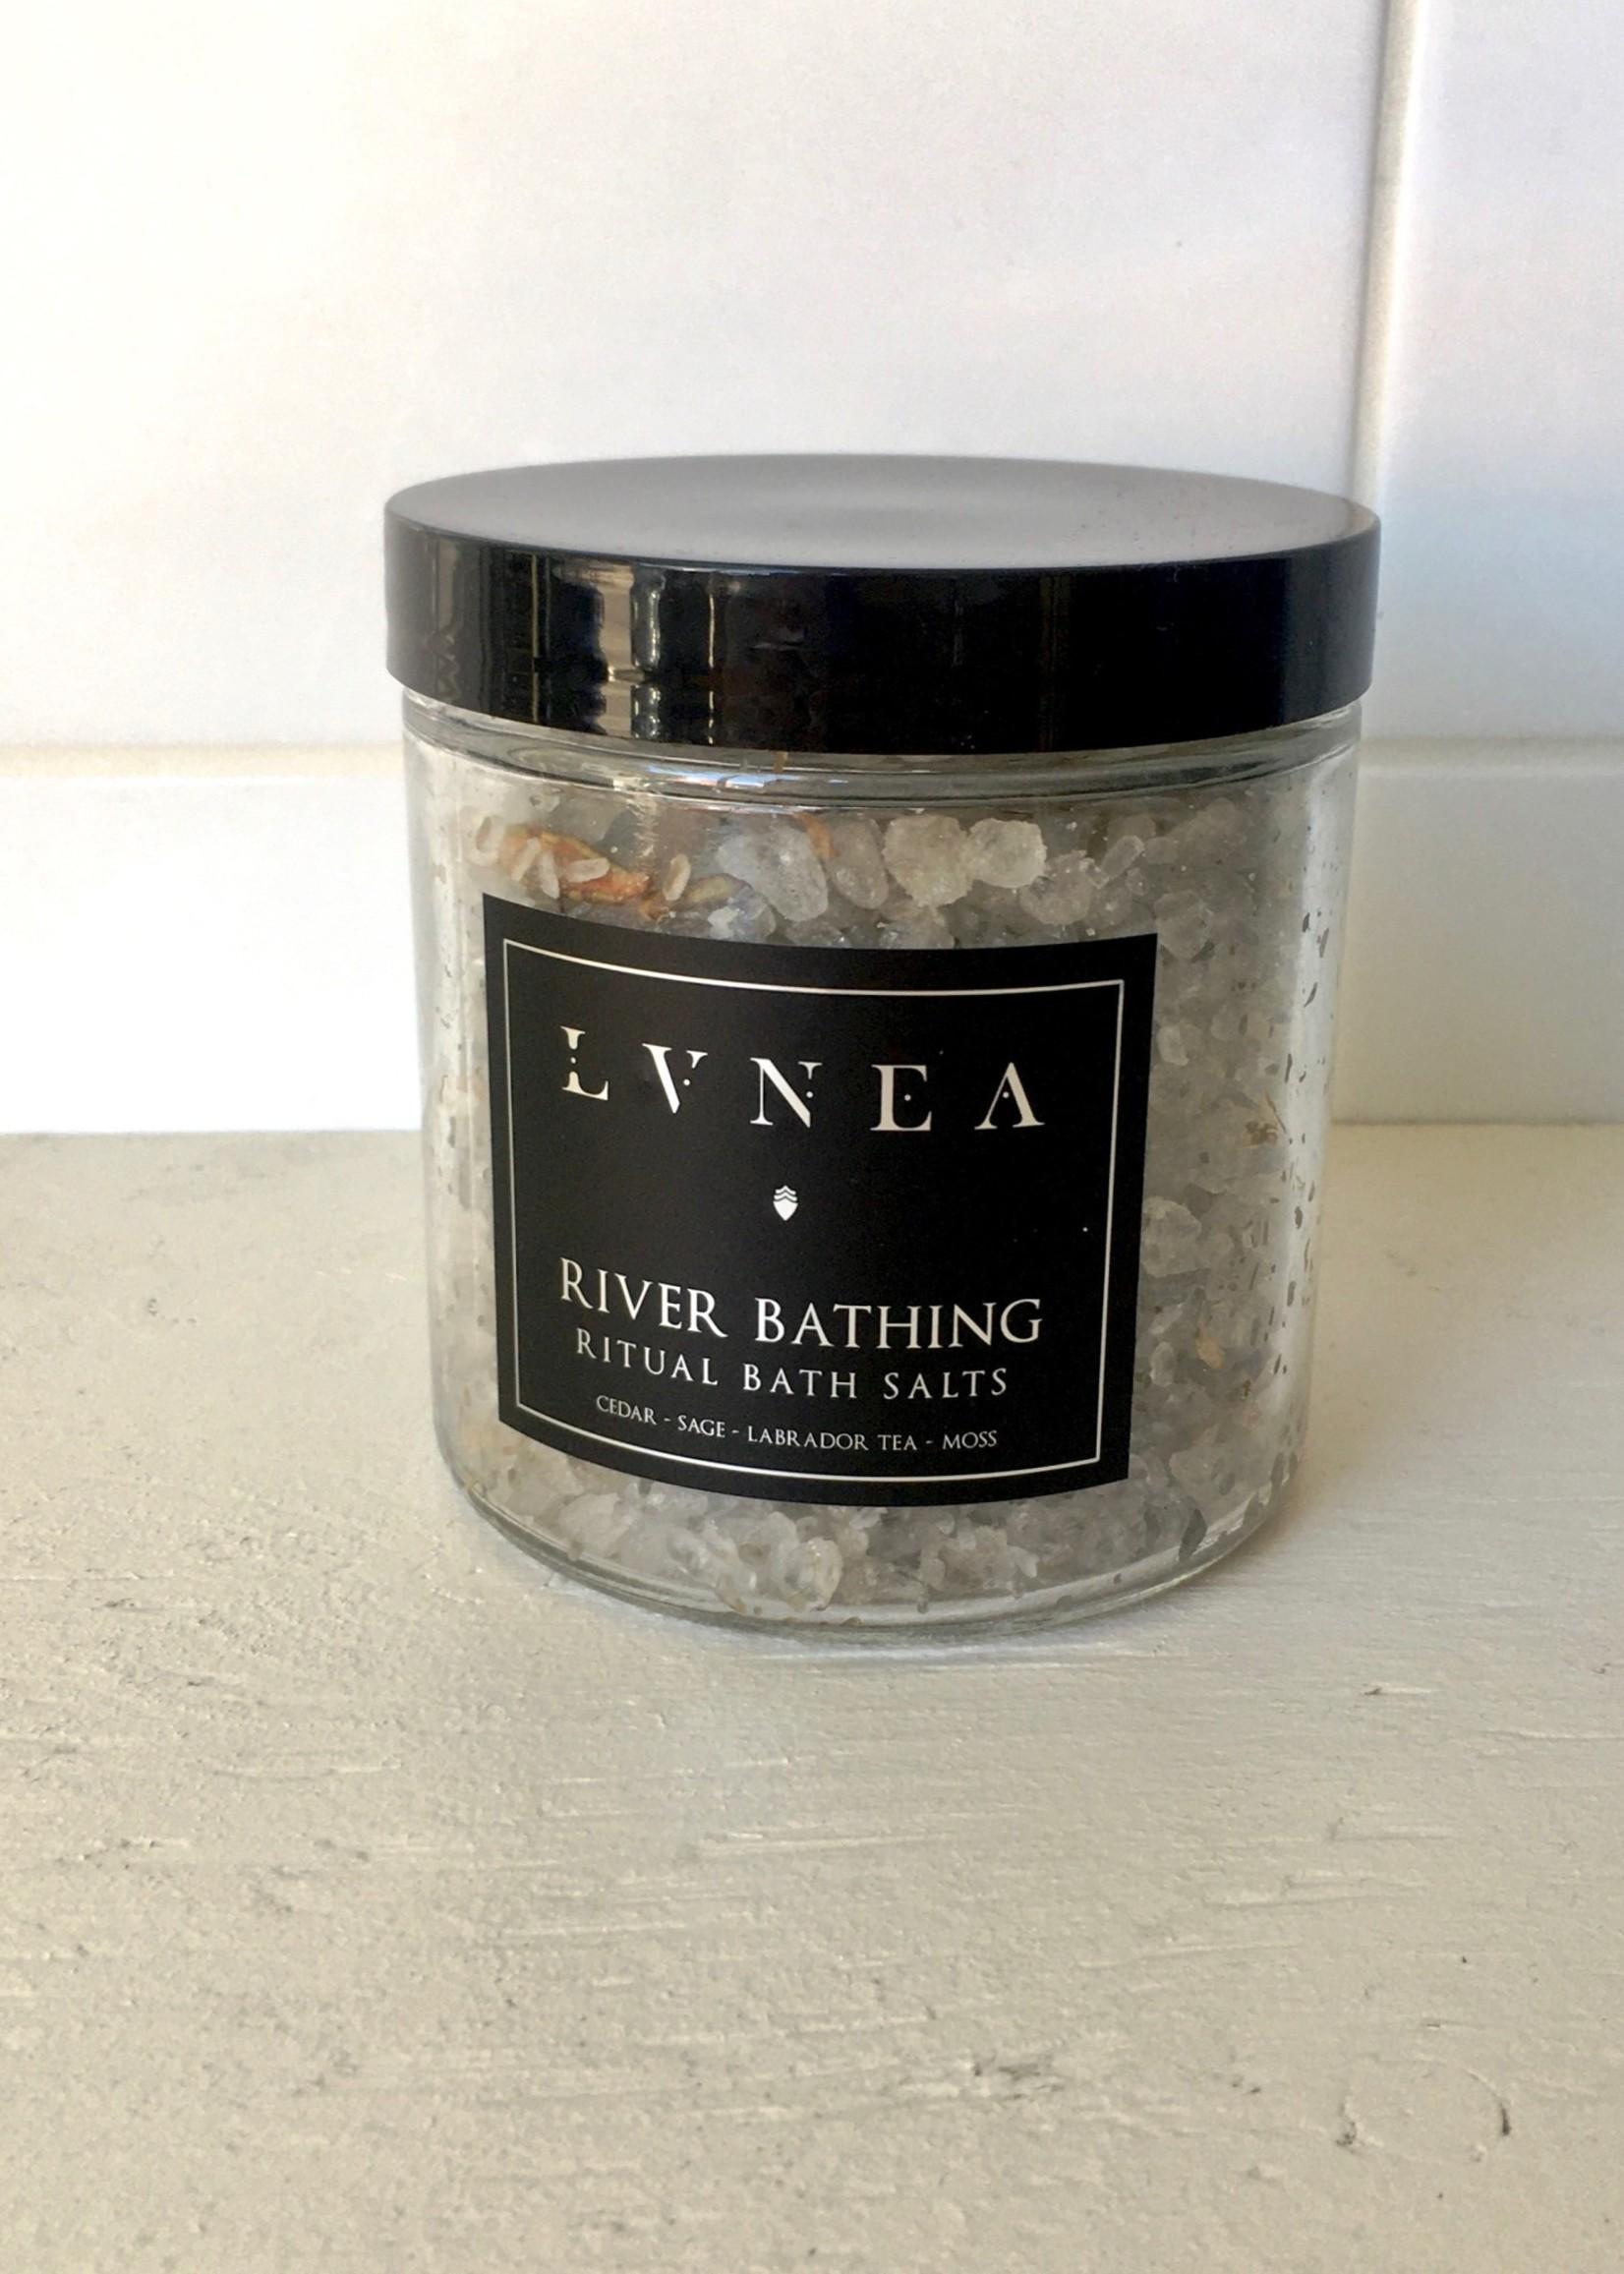 Lvnea Sels de bain rituels